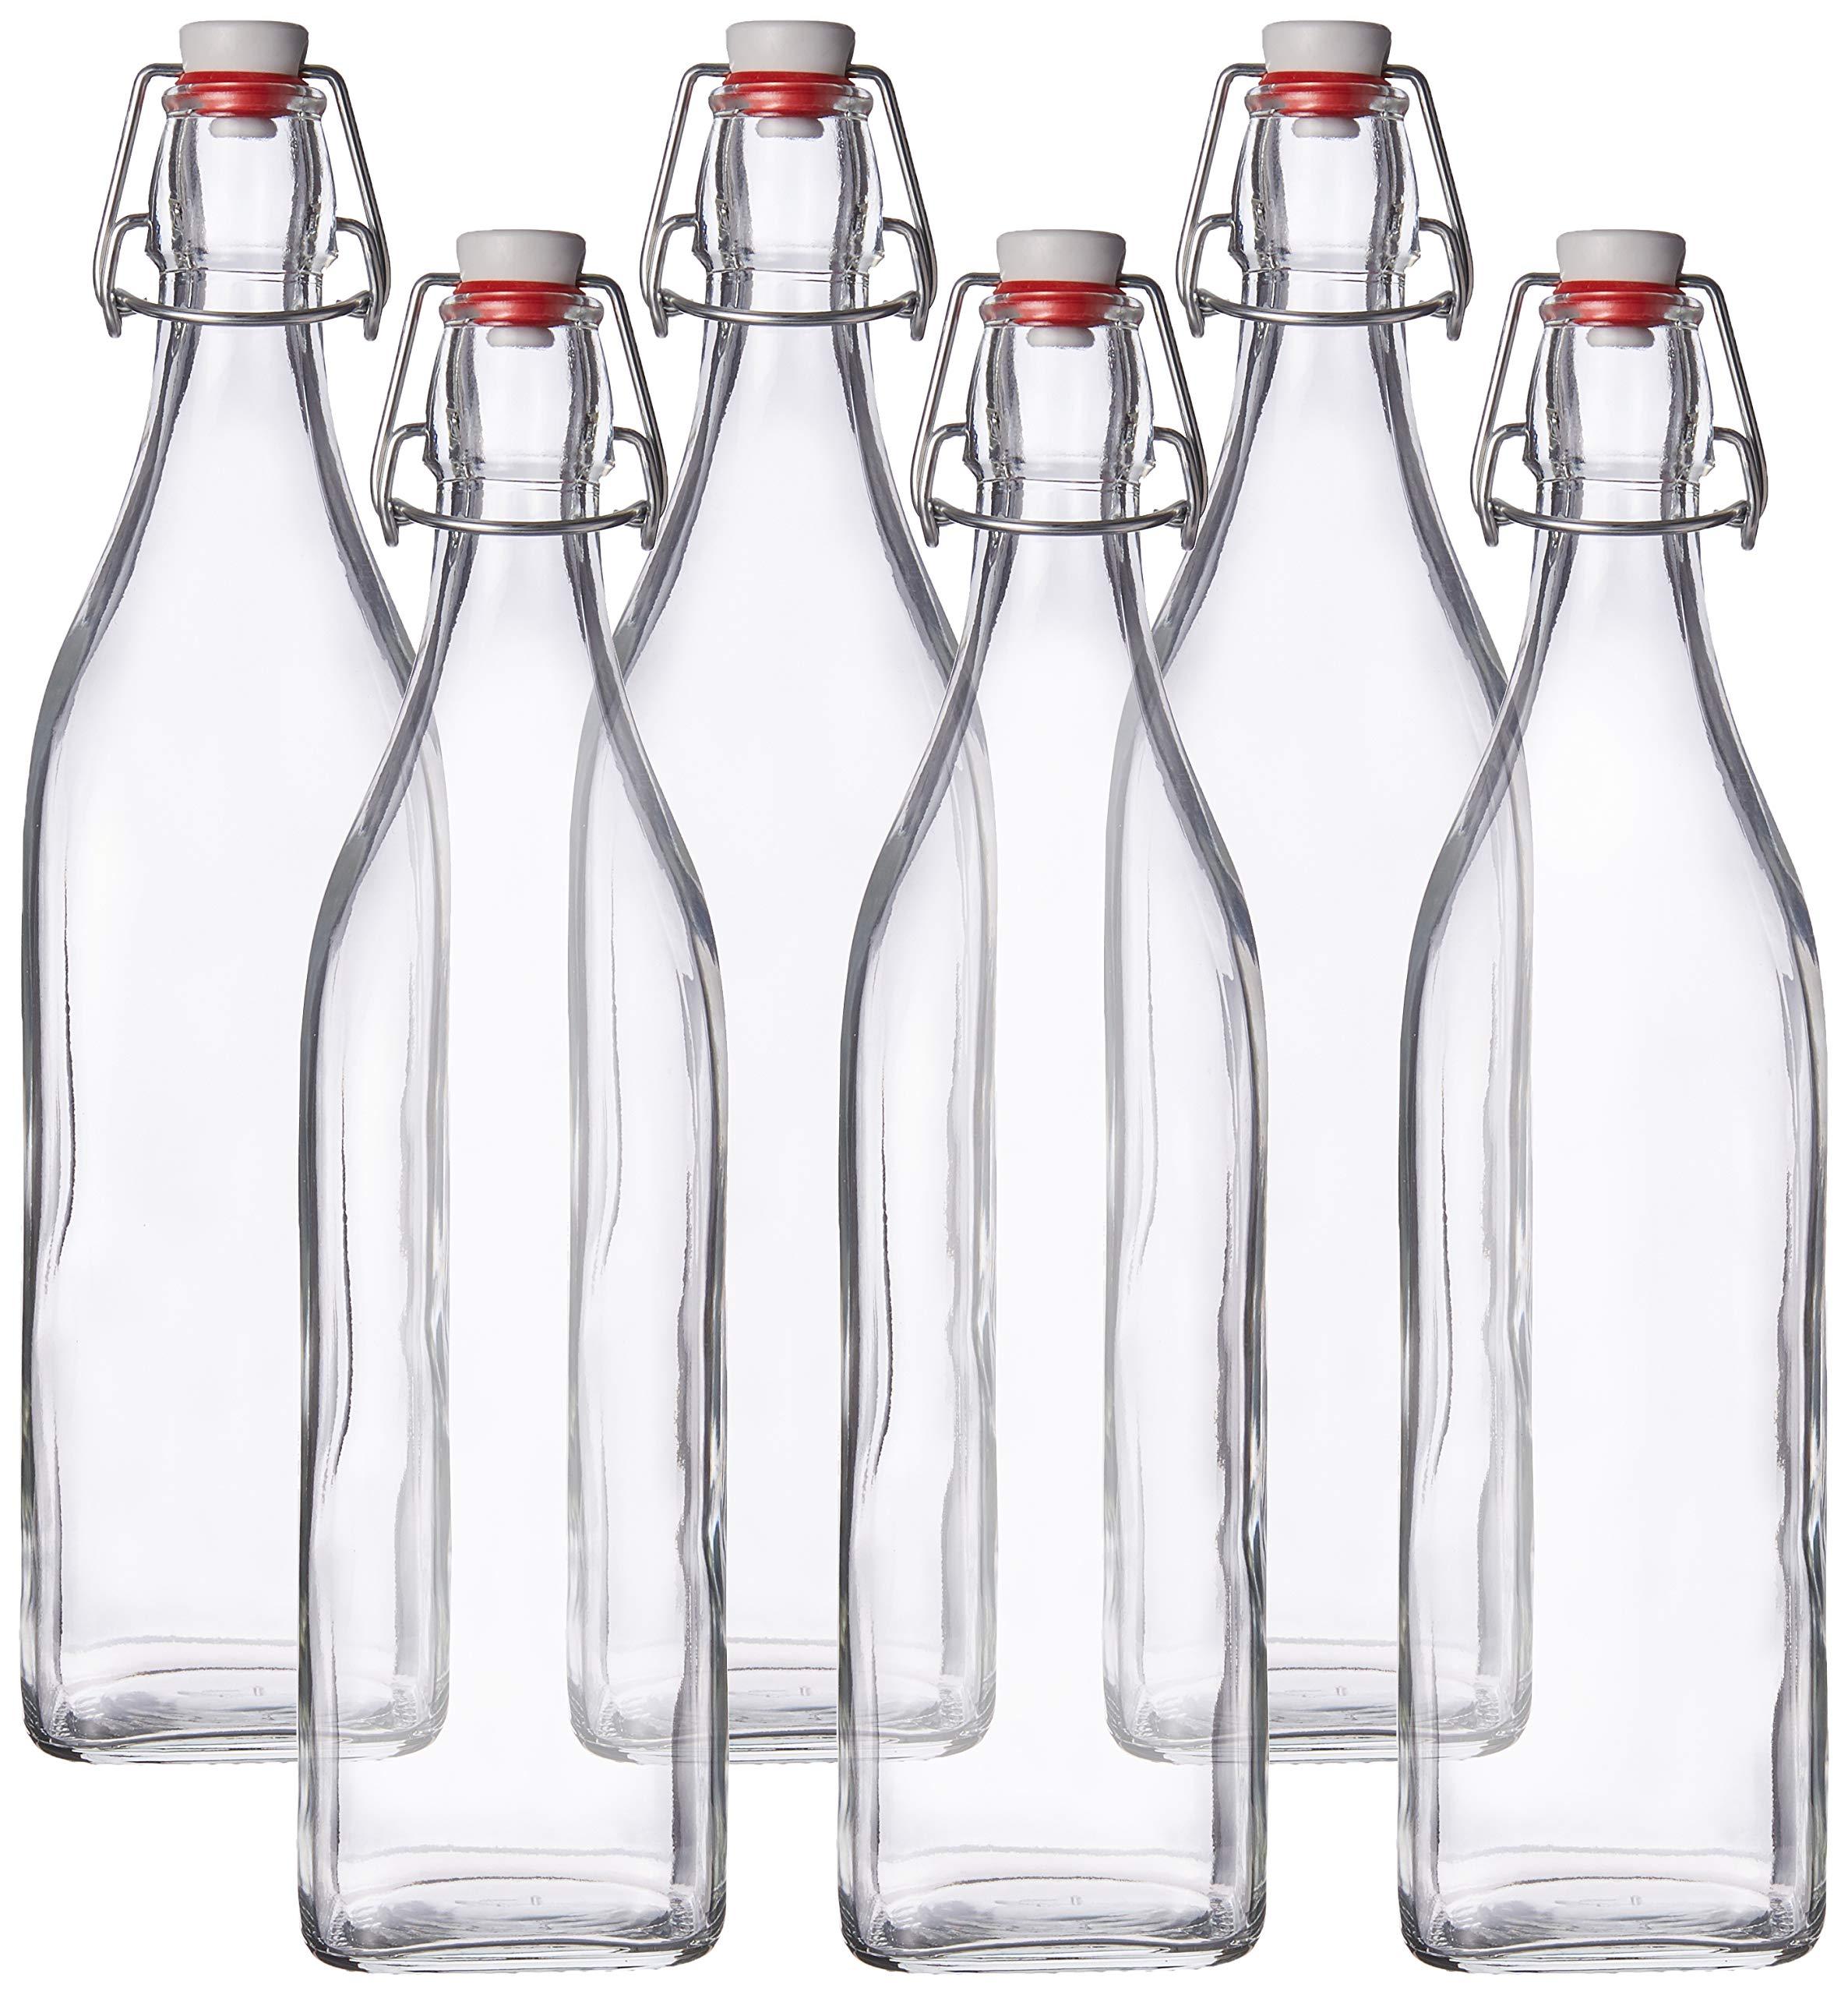 Bormioli Rocco Swing Top Round Glass Bottle, 6, Clear by Bormioli Rocco